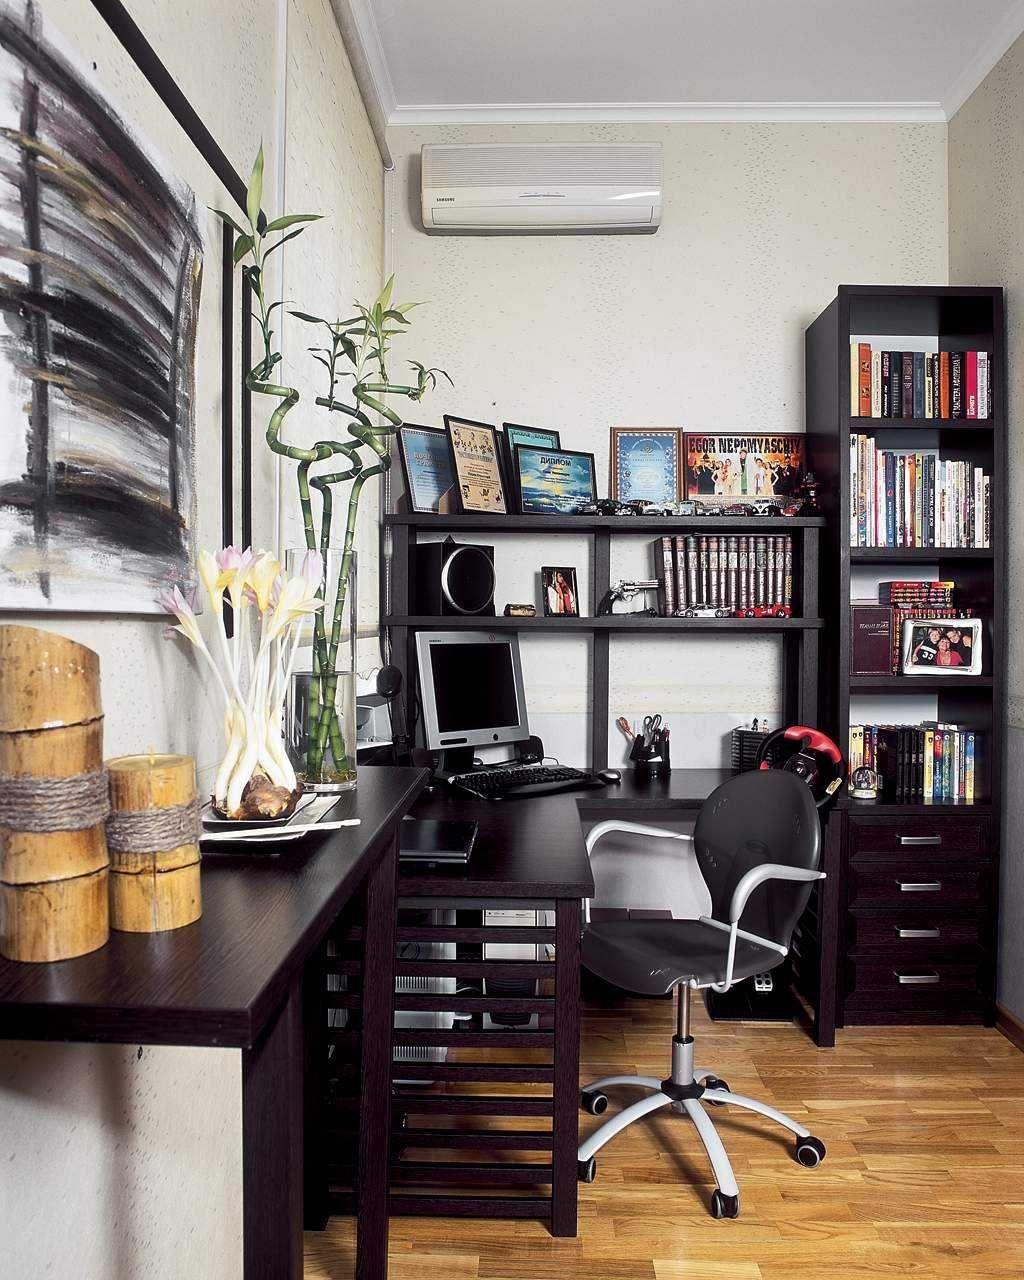 Home Study Room: Camere De Studiu (7) Home Study Rooms